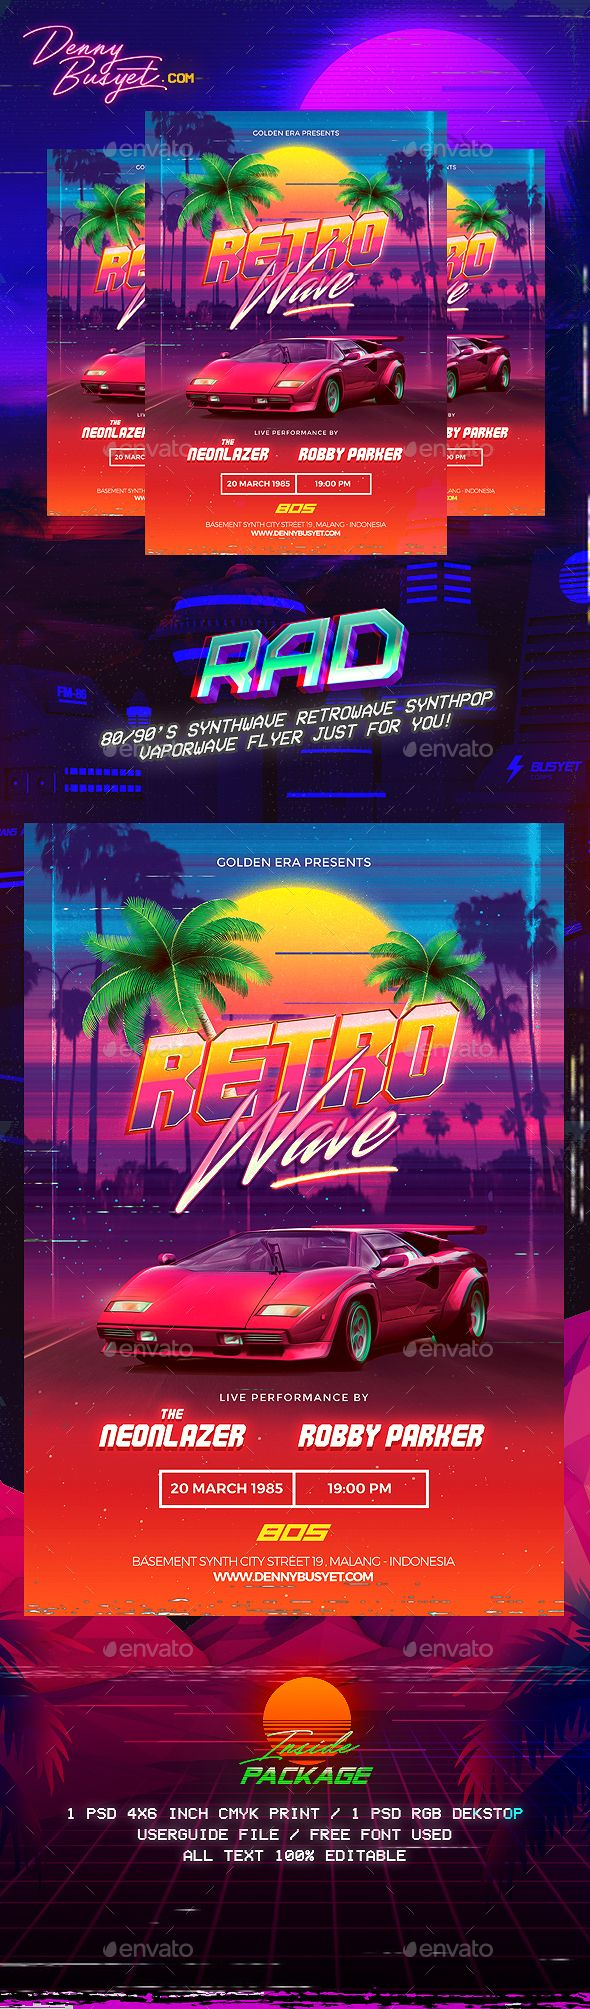 80s poster design - Retrowave 80 S Synthwave Flyer